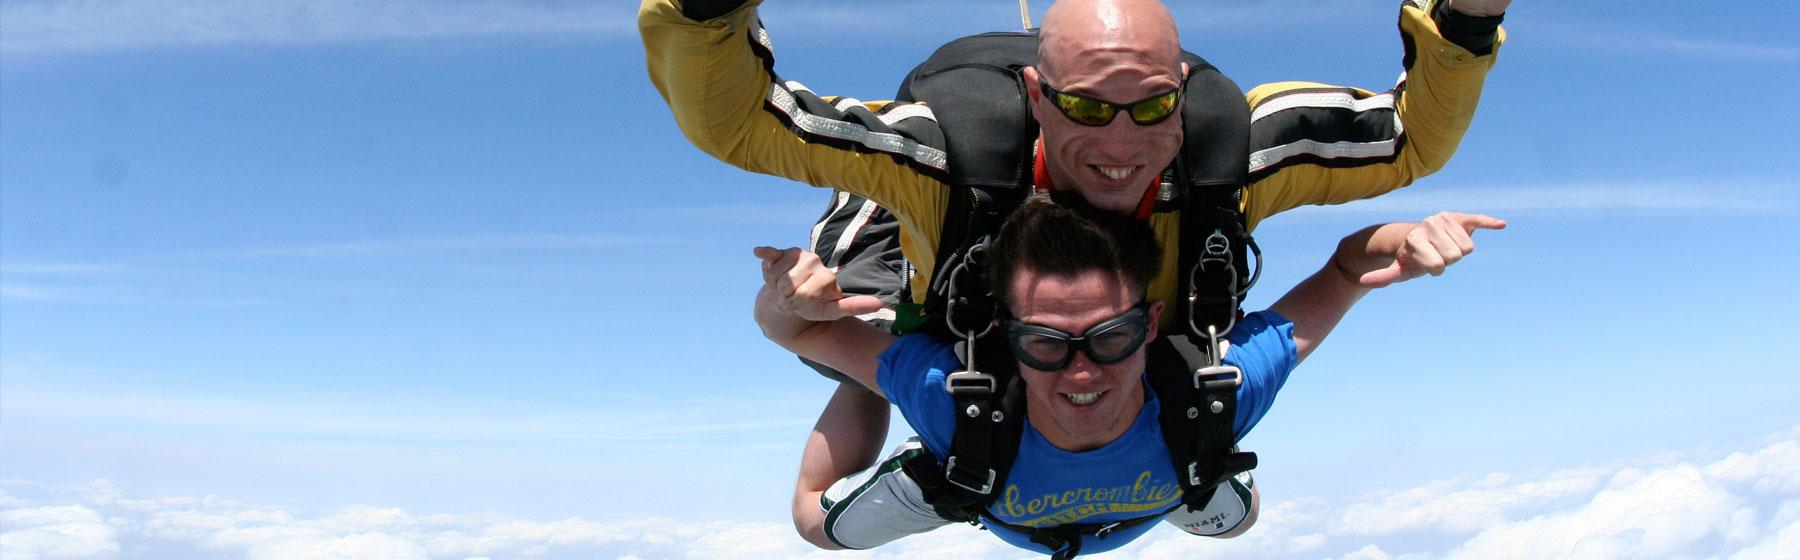 Skydive Alabama Tandem Skydiving